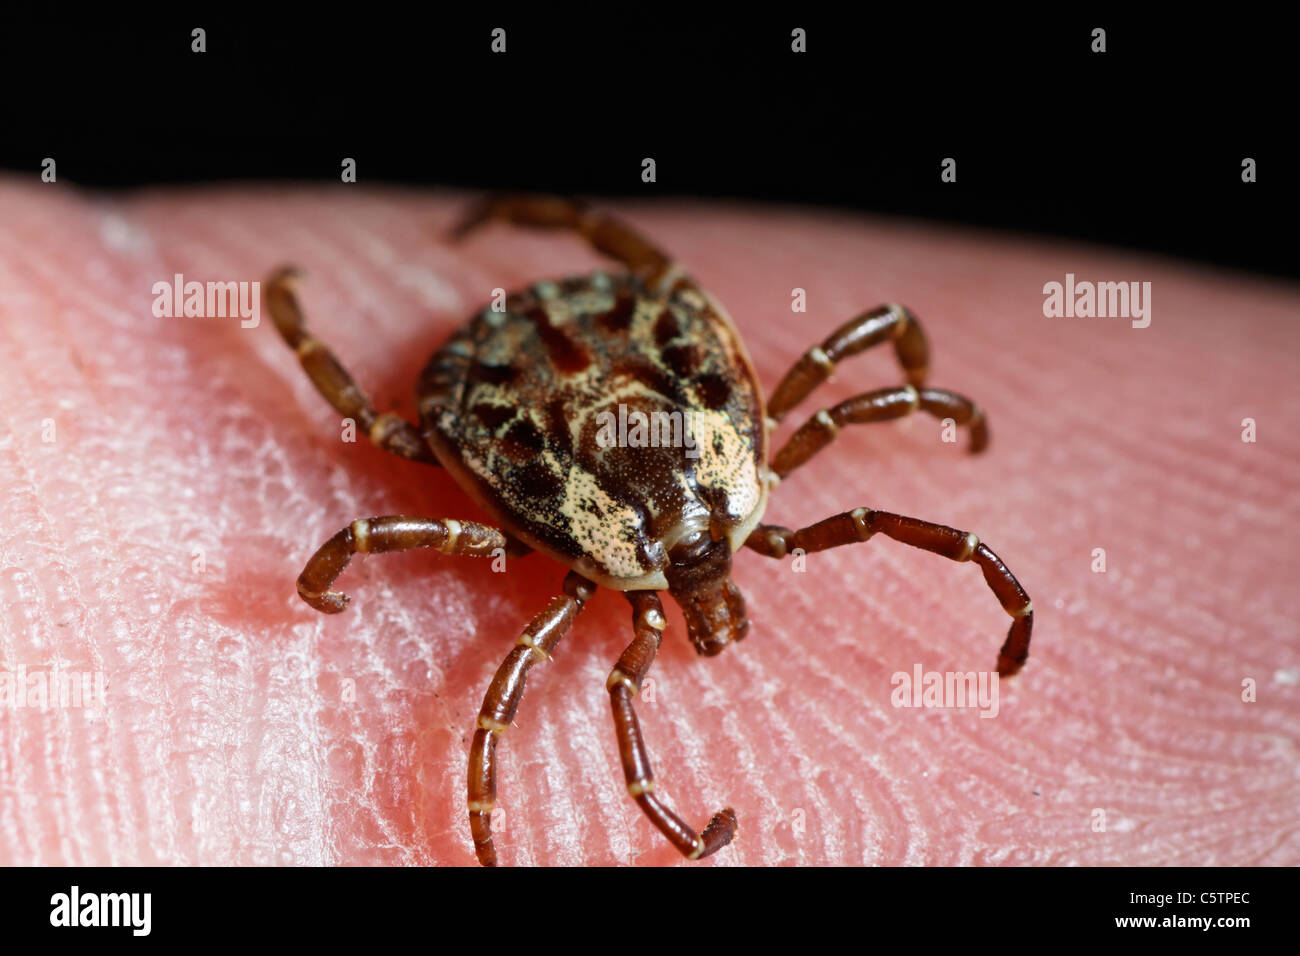 Costa Rica, tropical tick on skin - Stock Image